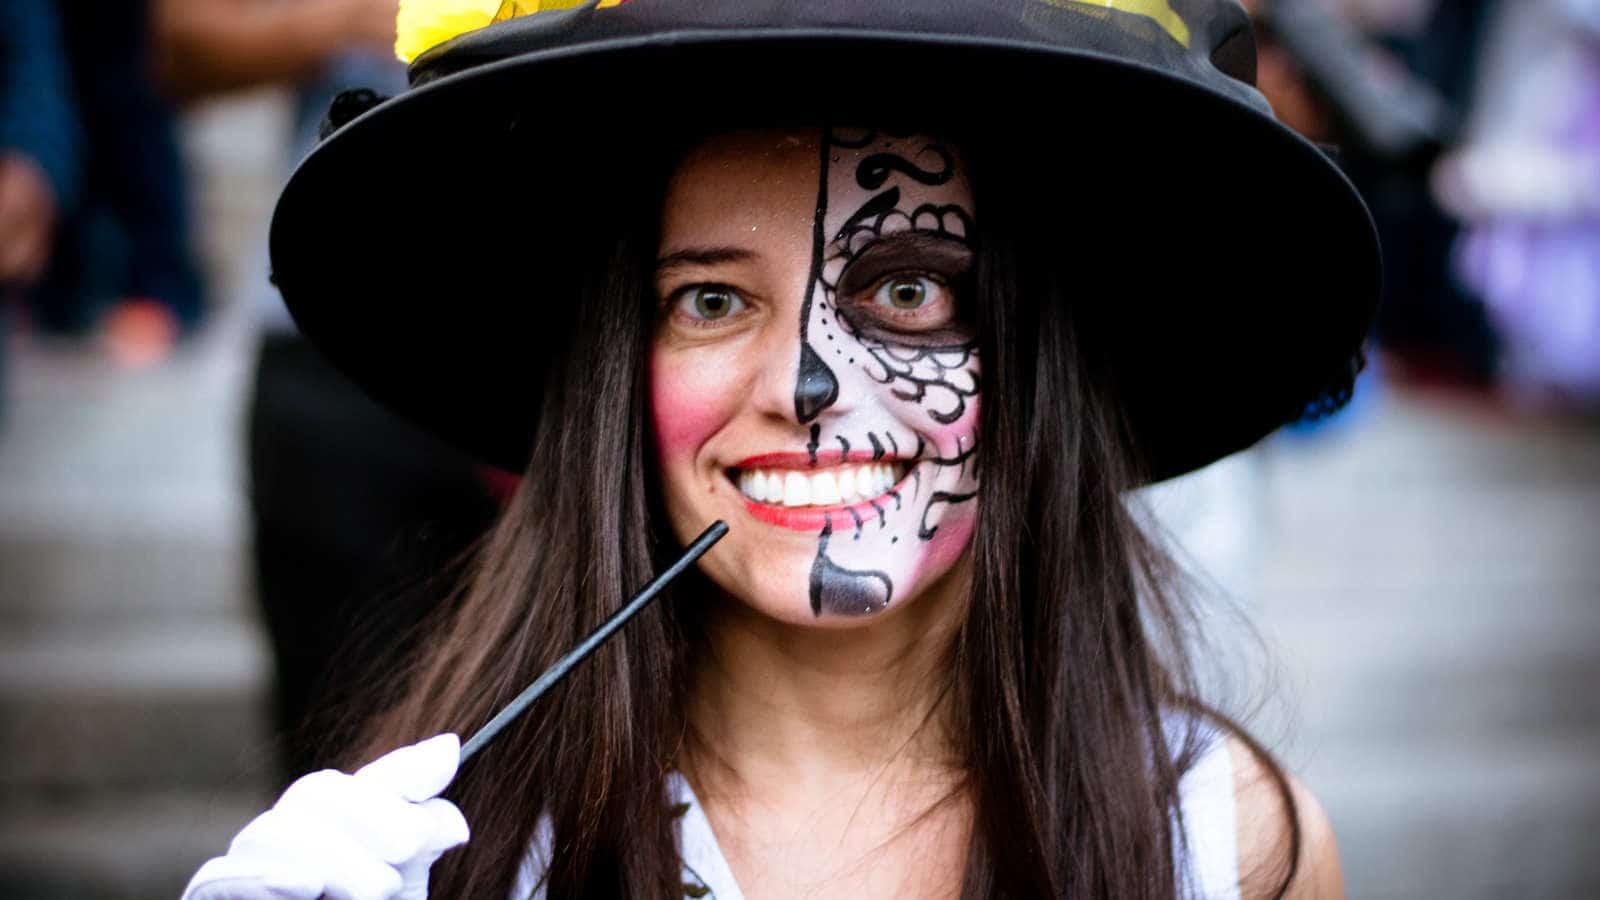 La Catrina-Tattoo- Was bedeutet La Catrina? Wir klären auf!